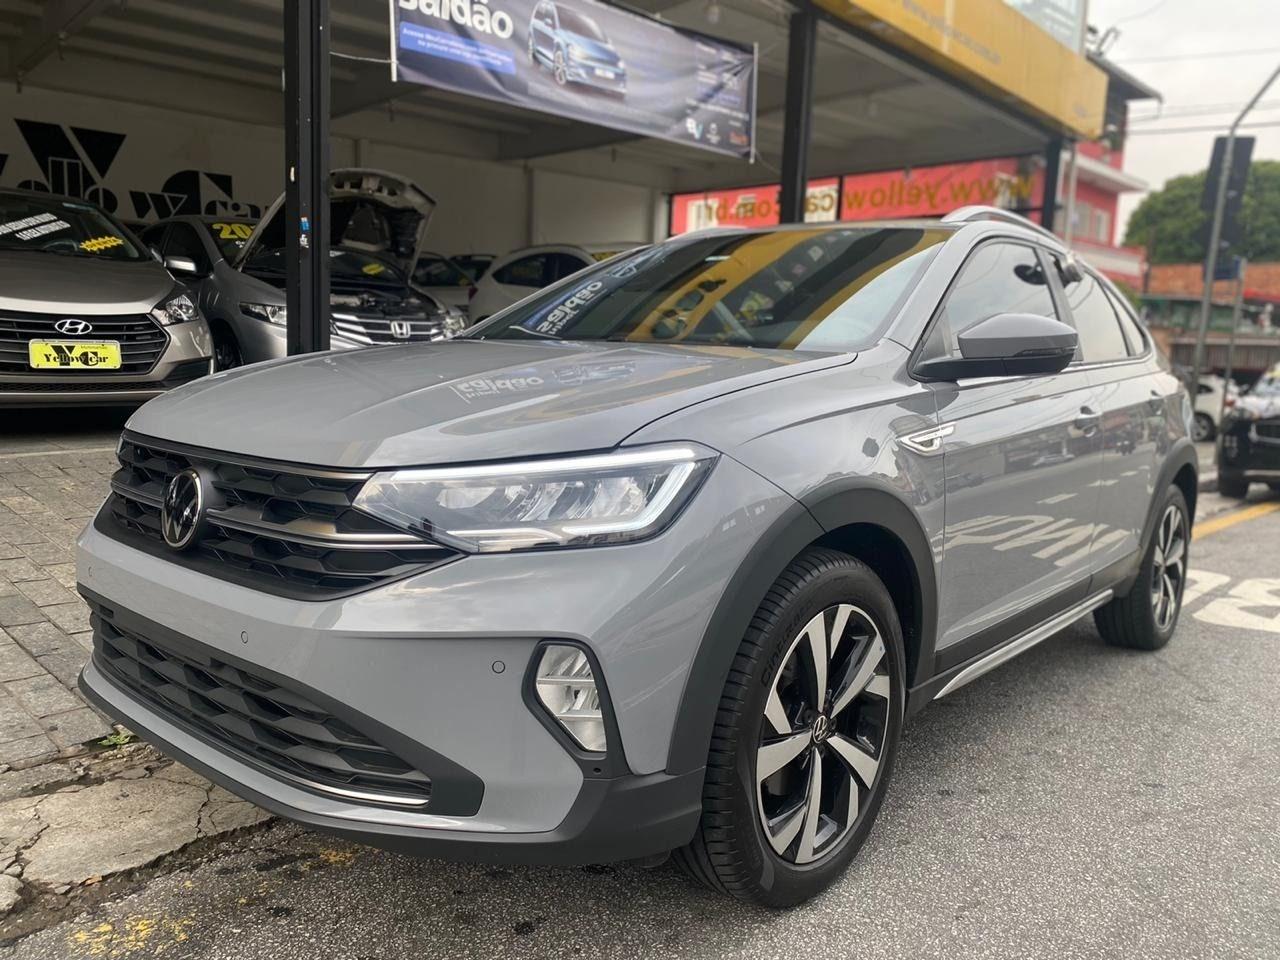 //www.autoline.com.br/carro/volkswagen/nivus-10-200-tsi-highline-12v-flex-4p-turbo-automat/2021/sao-paulo-sp/14292410